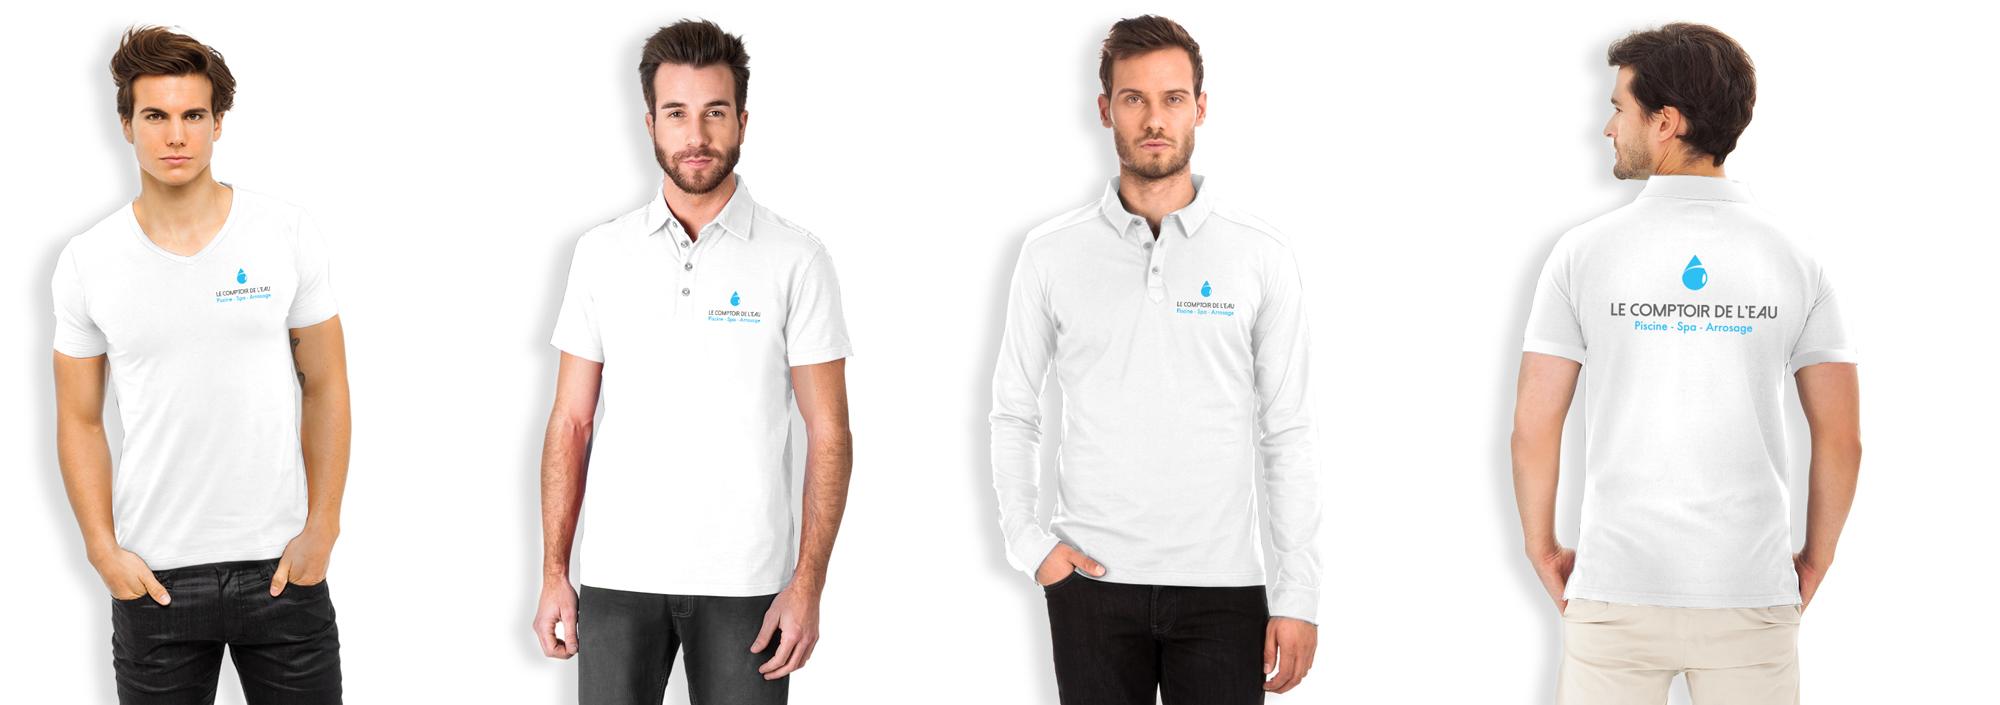 Tshirt-ComptoirEau-1.2